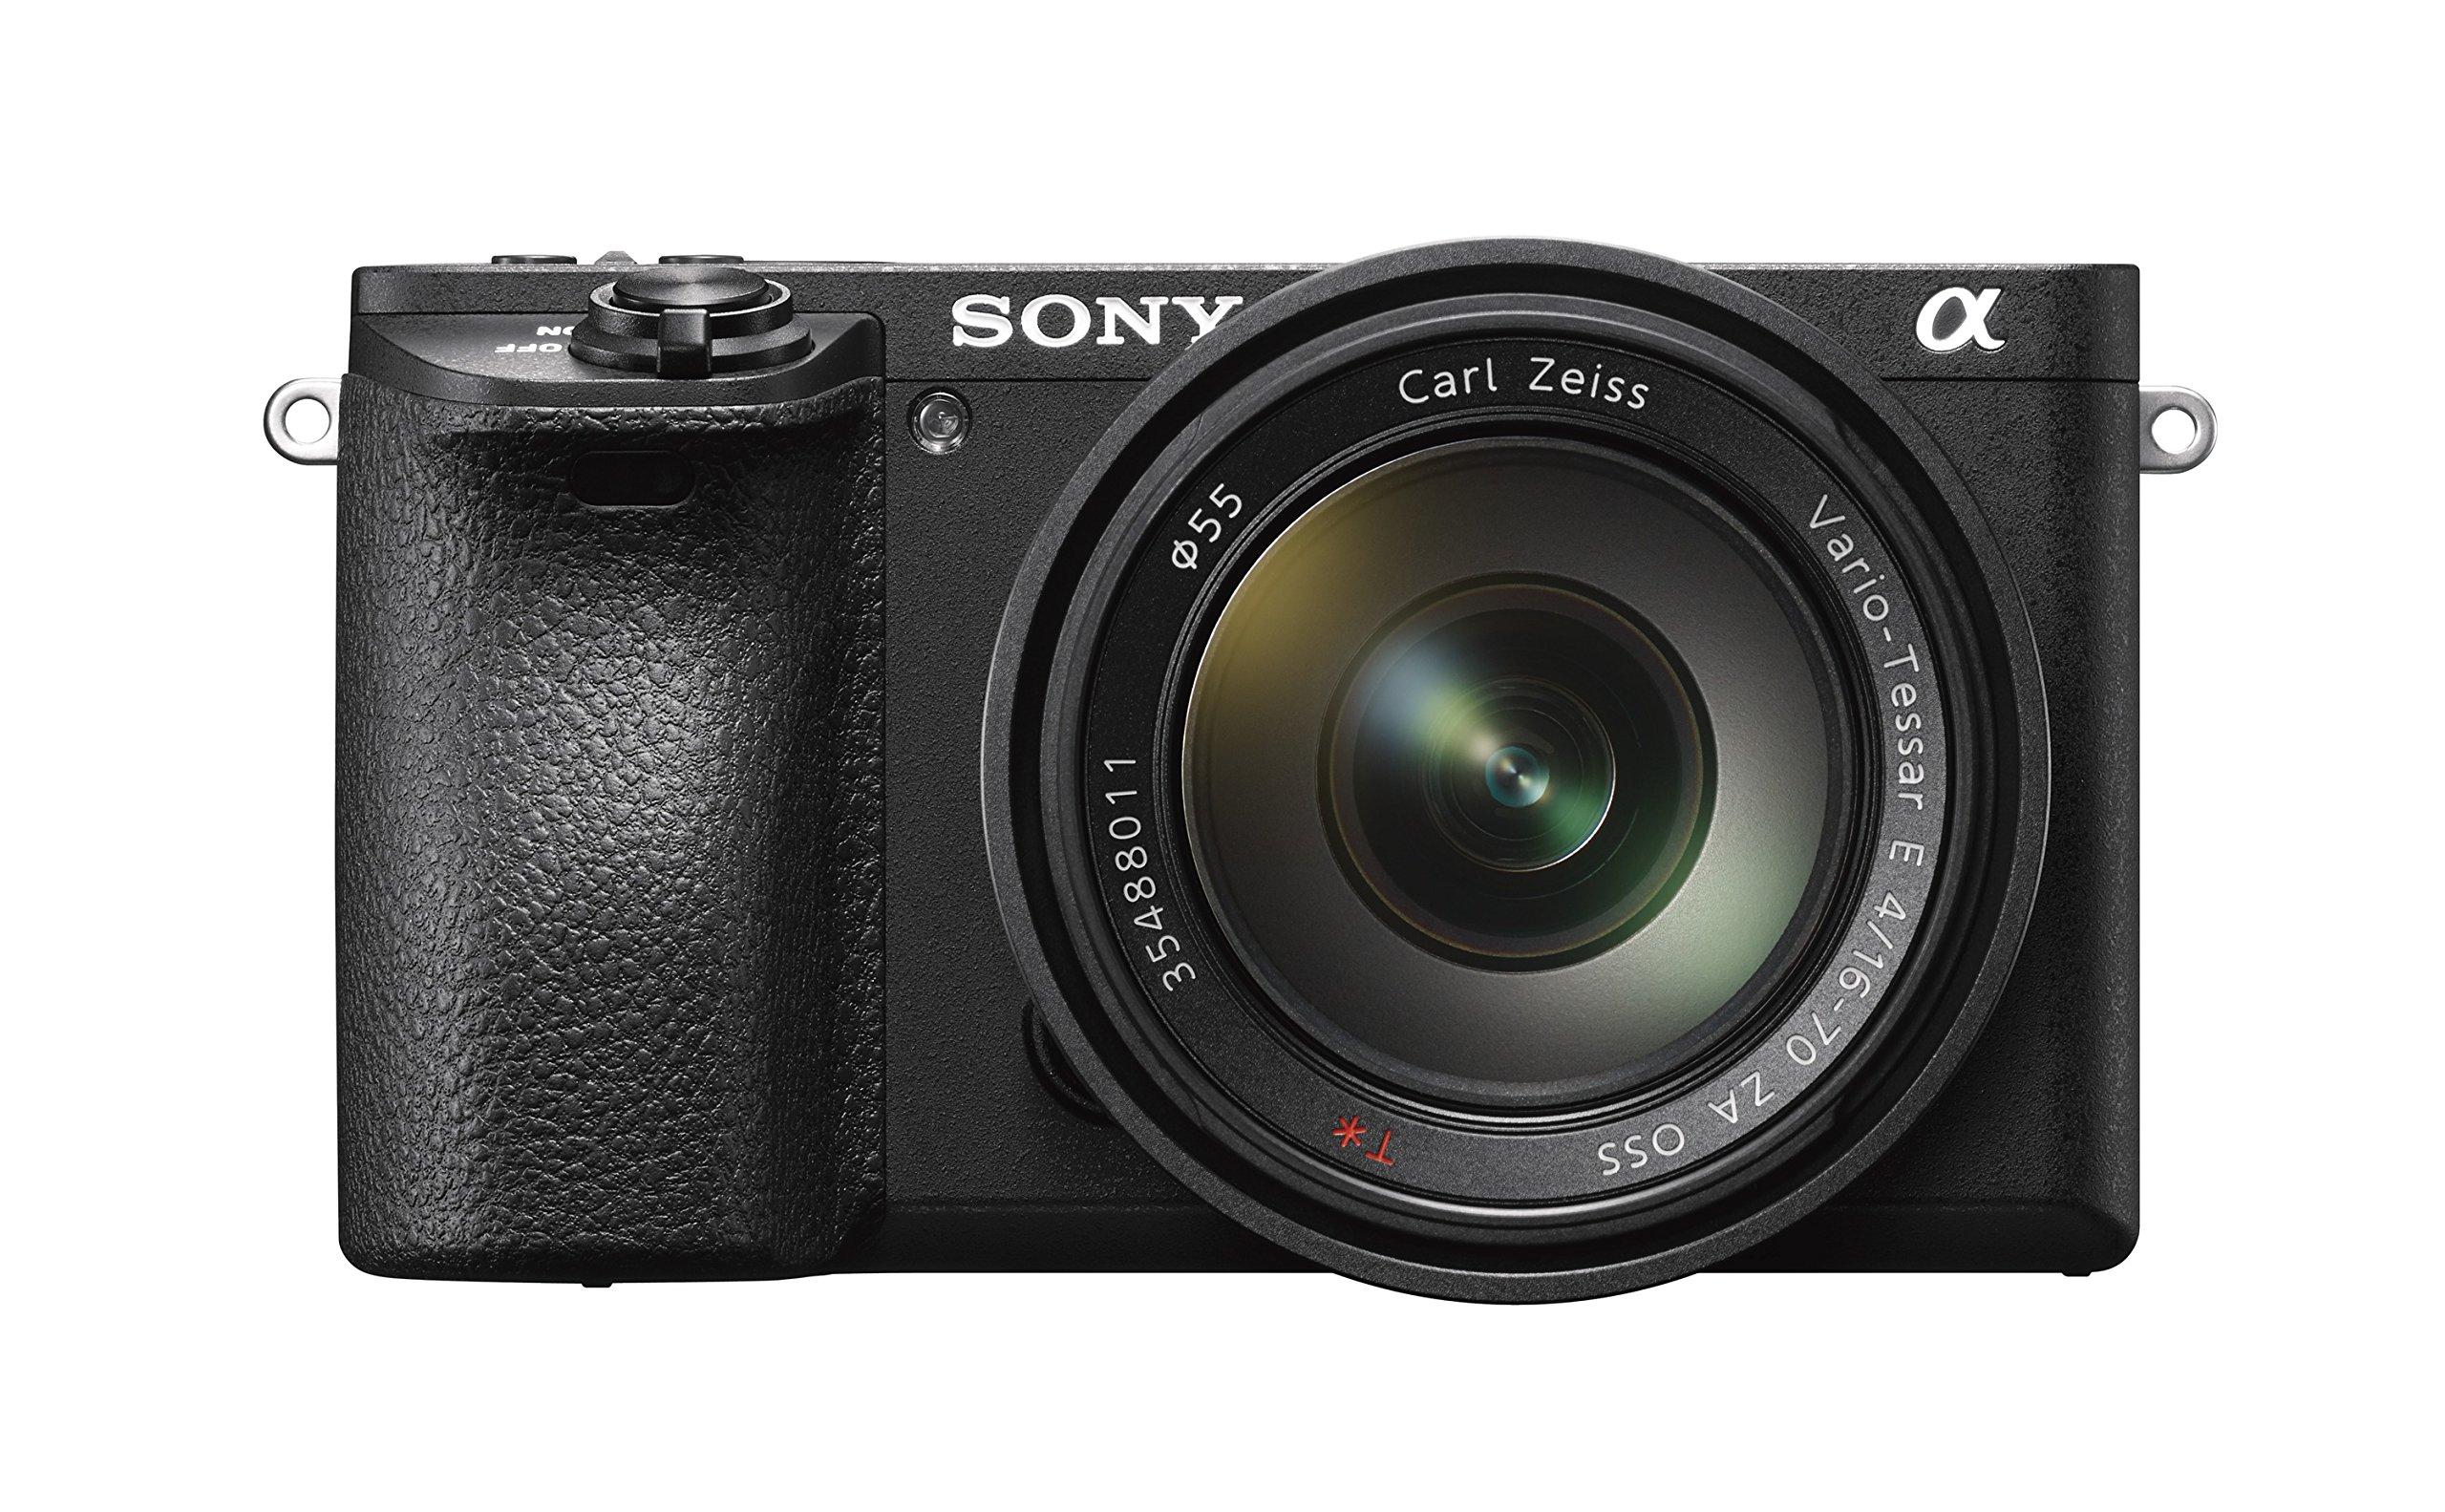 Sony Alpha 6500 Kit Fotocamera Digitale Mirrorless Compatta con Obiettivo Intercambiabile SEL 16-70 mm Zeiss, Sensore APS-C CMOS Exmor HD da 24.2 MP, 425 pt Fast Hybrid AF 11 fps, Nero product image